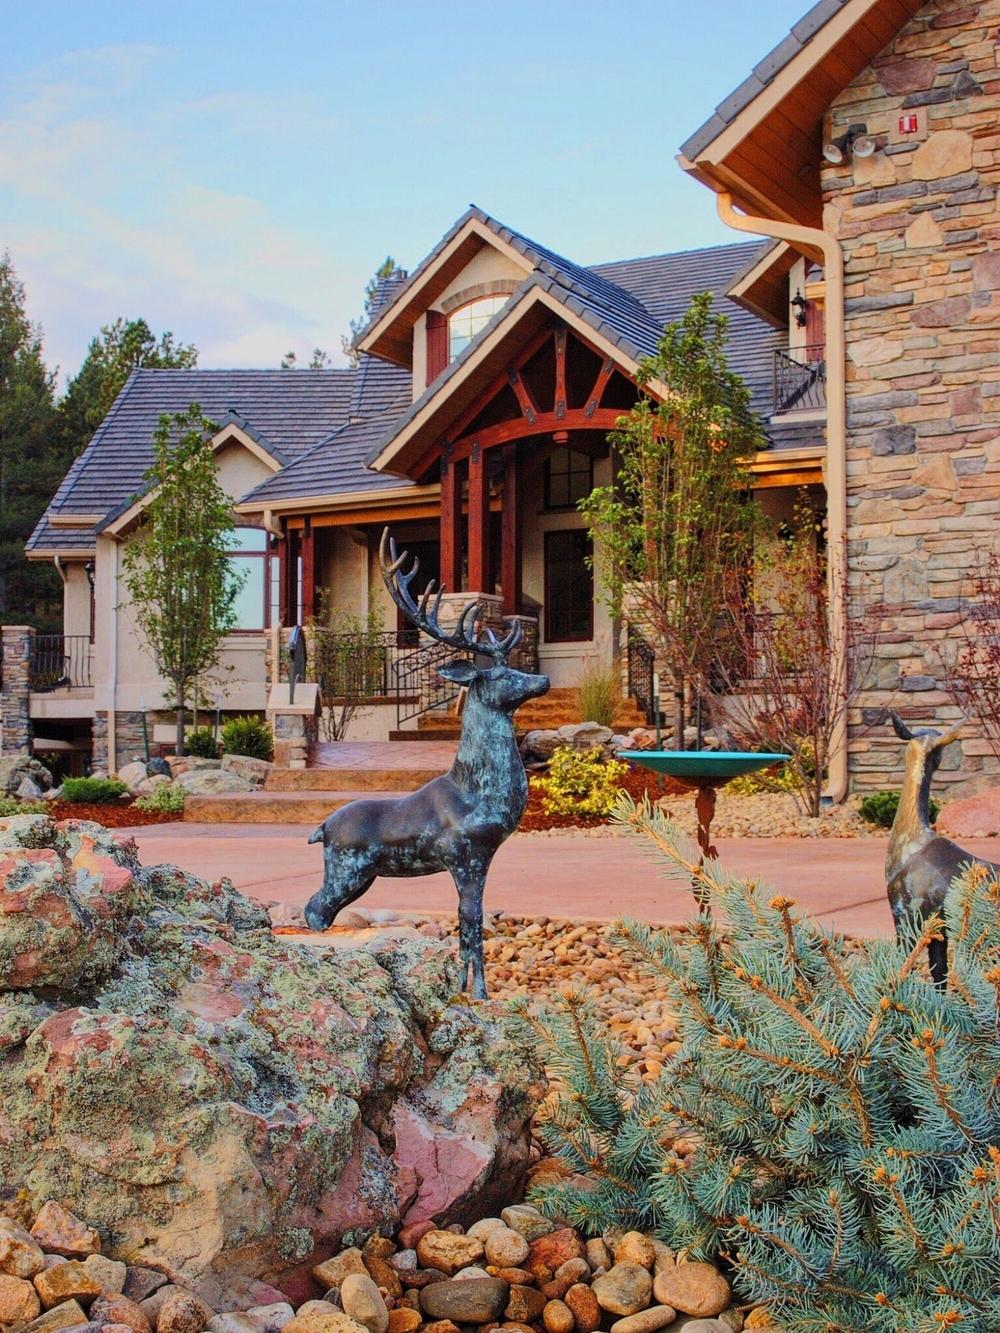 LGA_Studios_Portfolio_Woodman_Valley_Sculpture.jpg